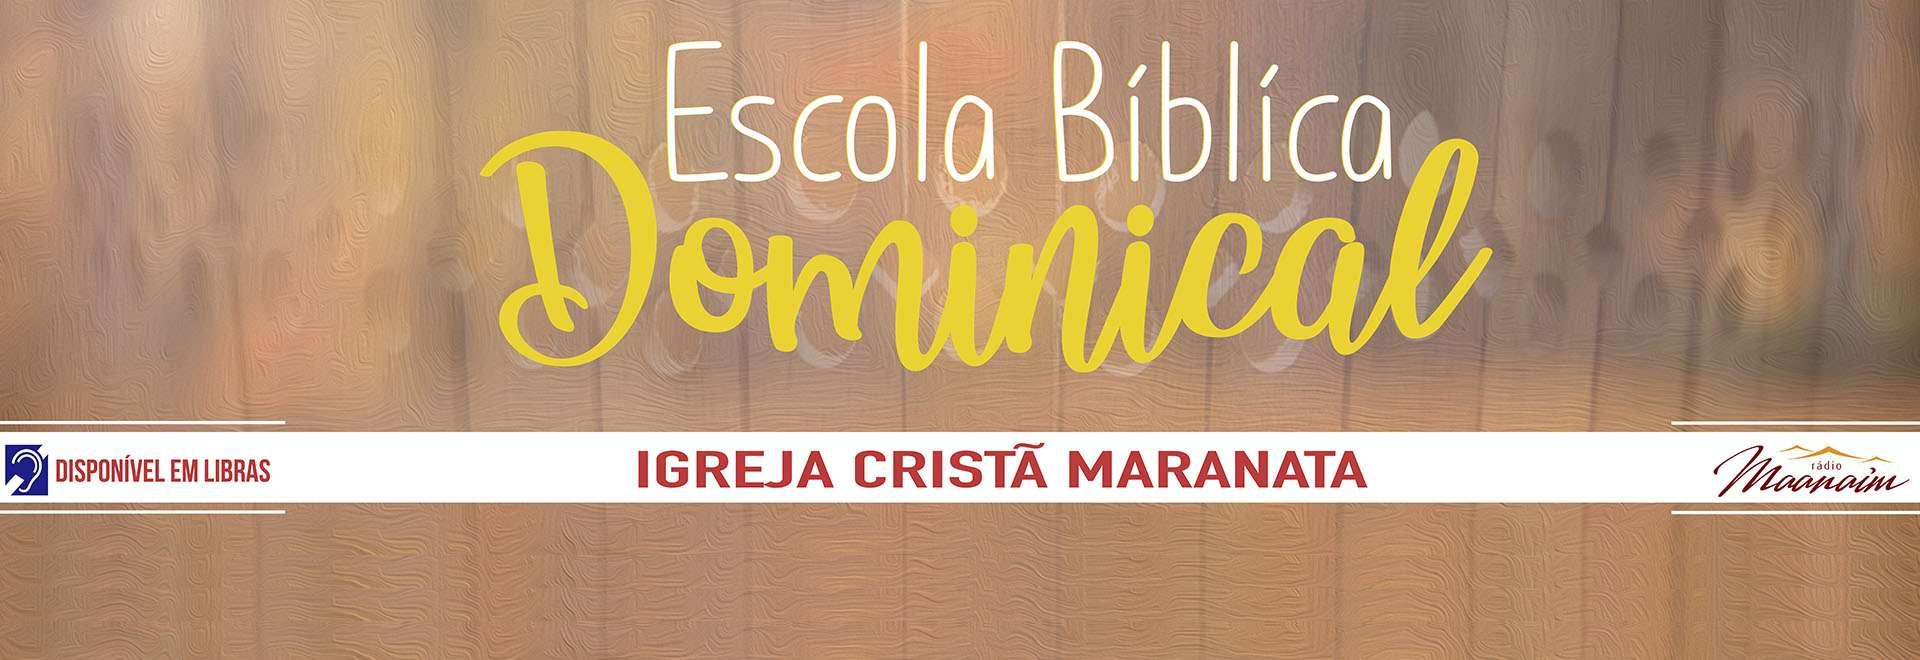 Participações da EBD da Igreja Cristã Maranata - 15/11/2020